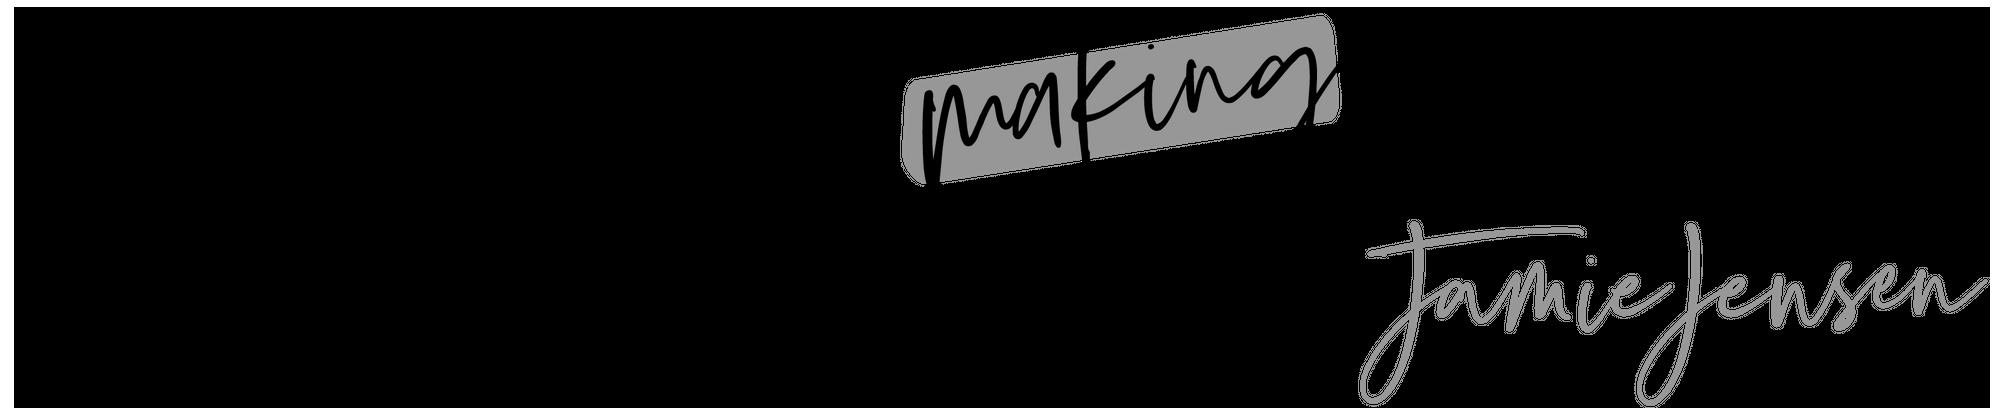 Creative Making Money Logo